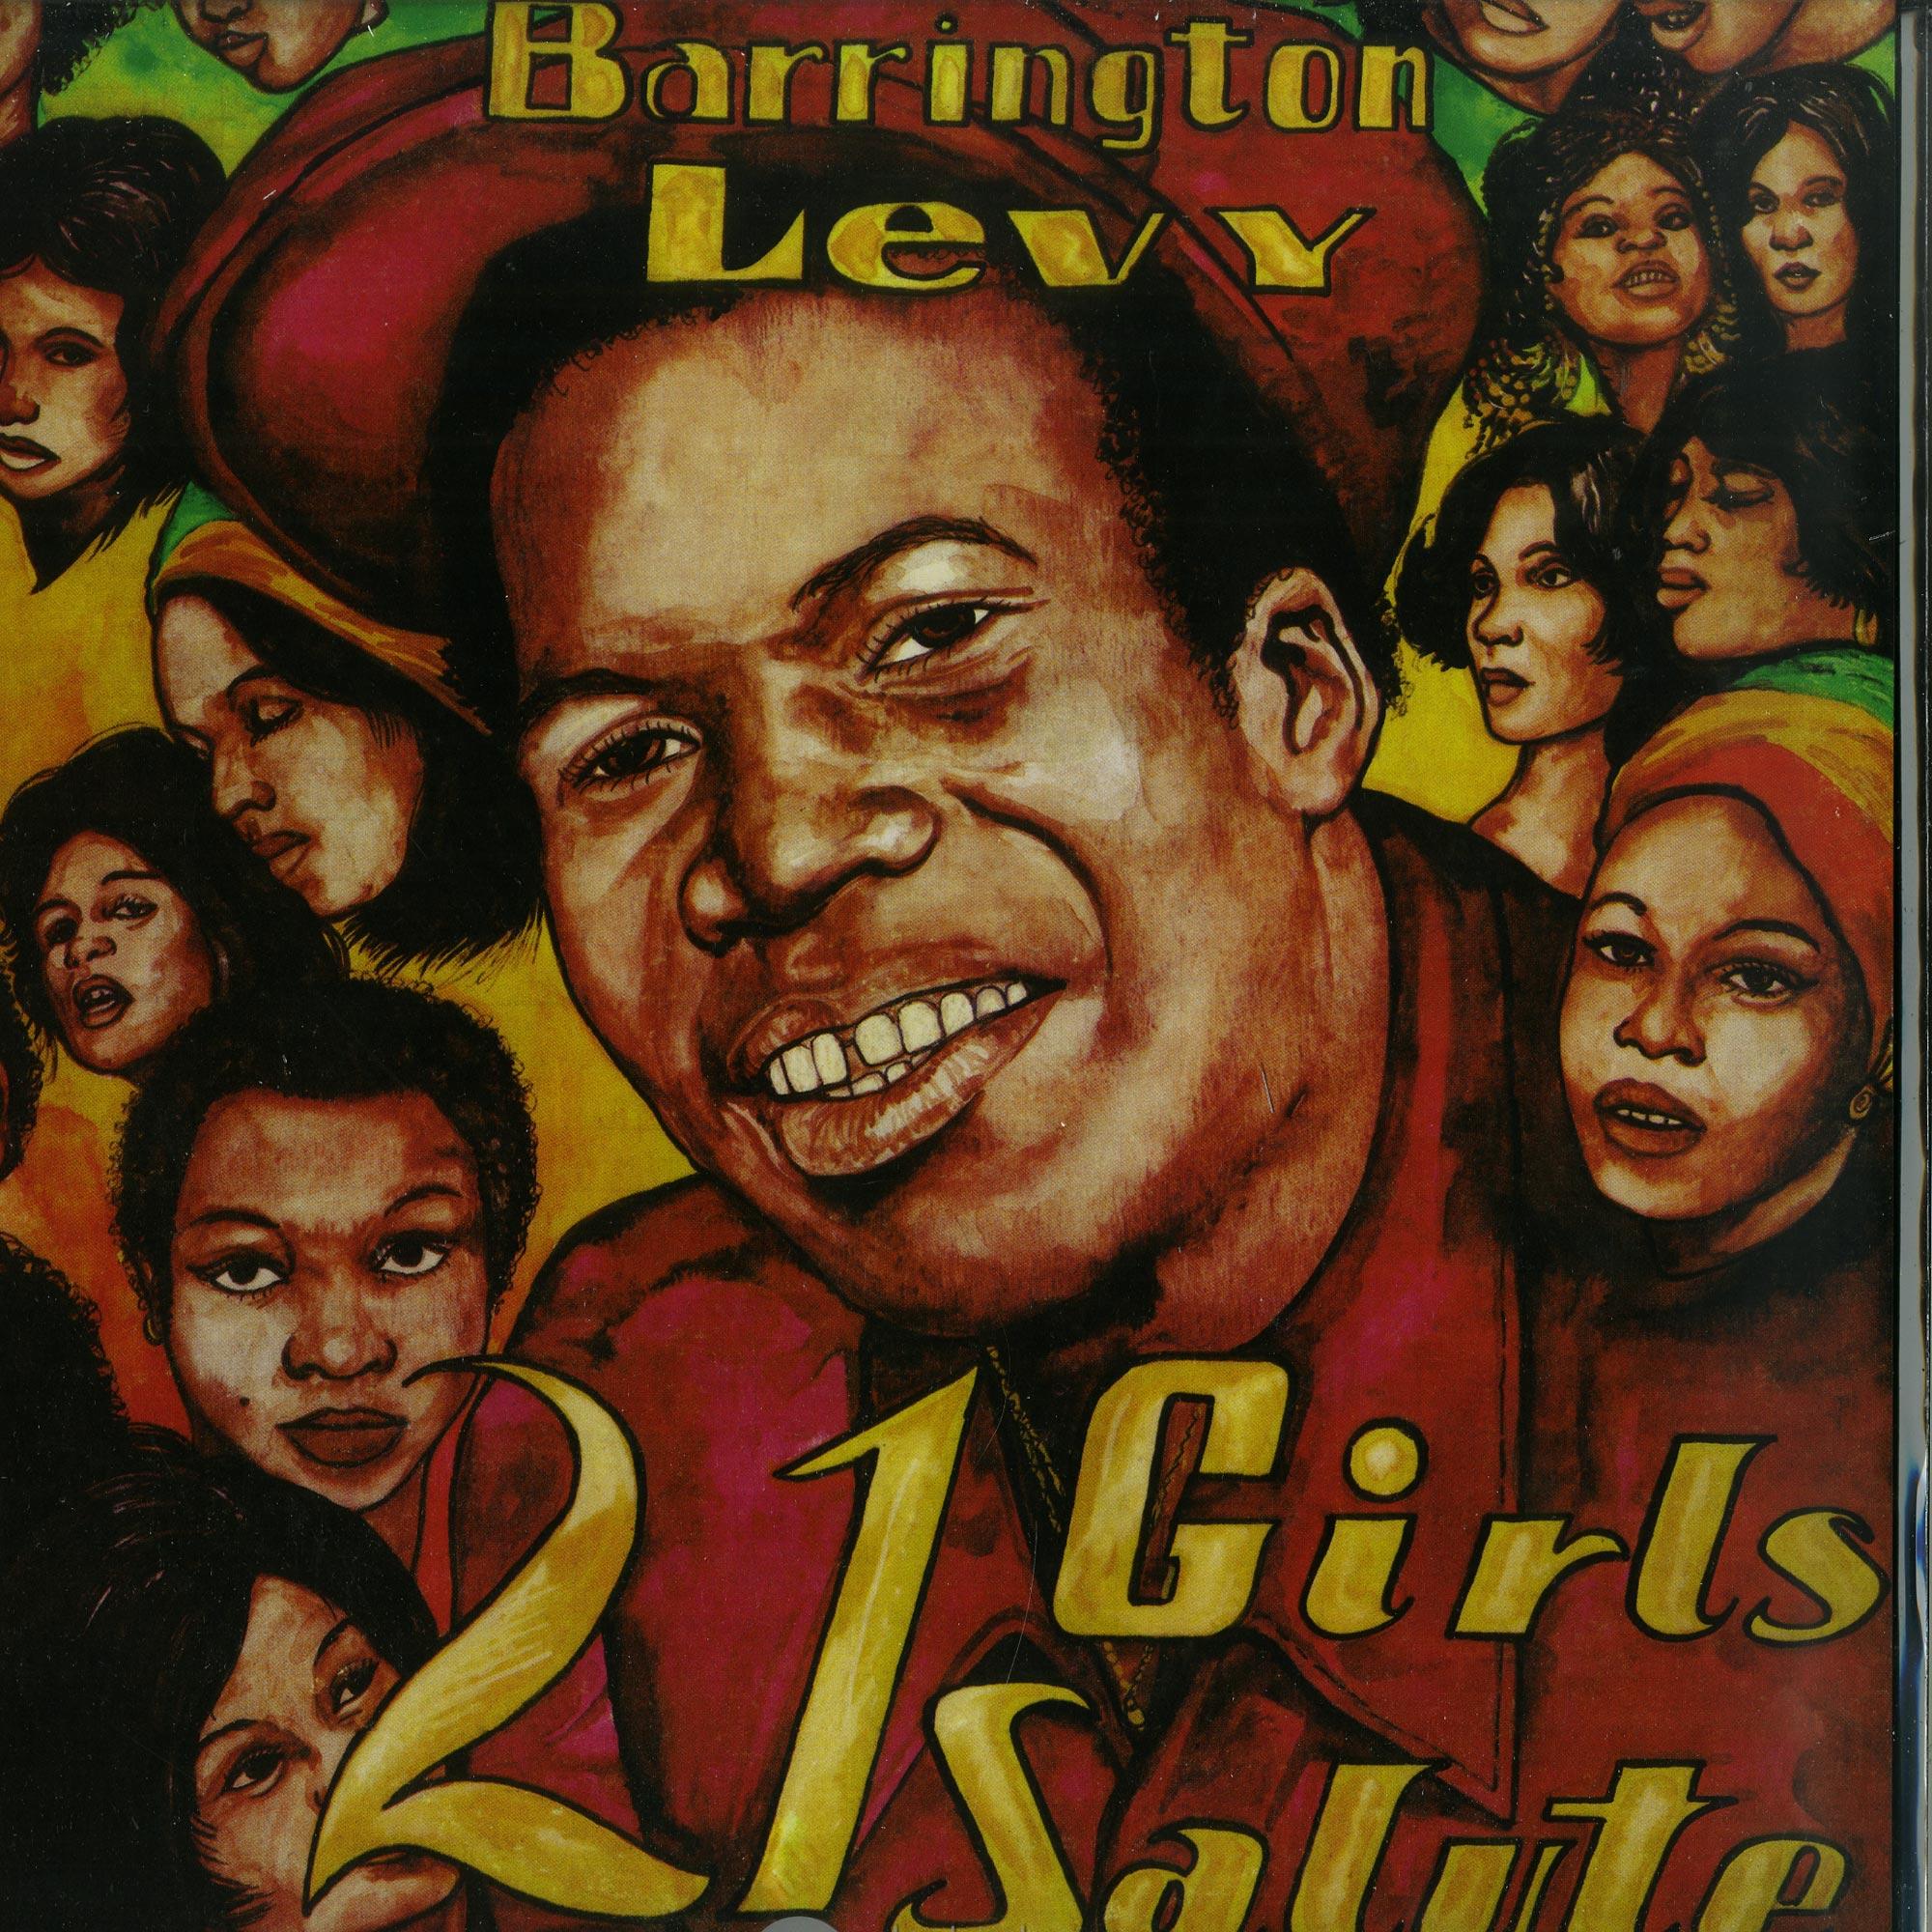 Barrington Levy - 21 GIRLS SALUTE